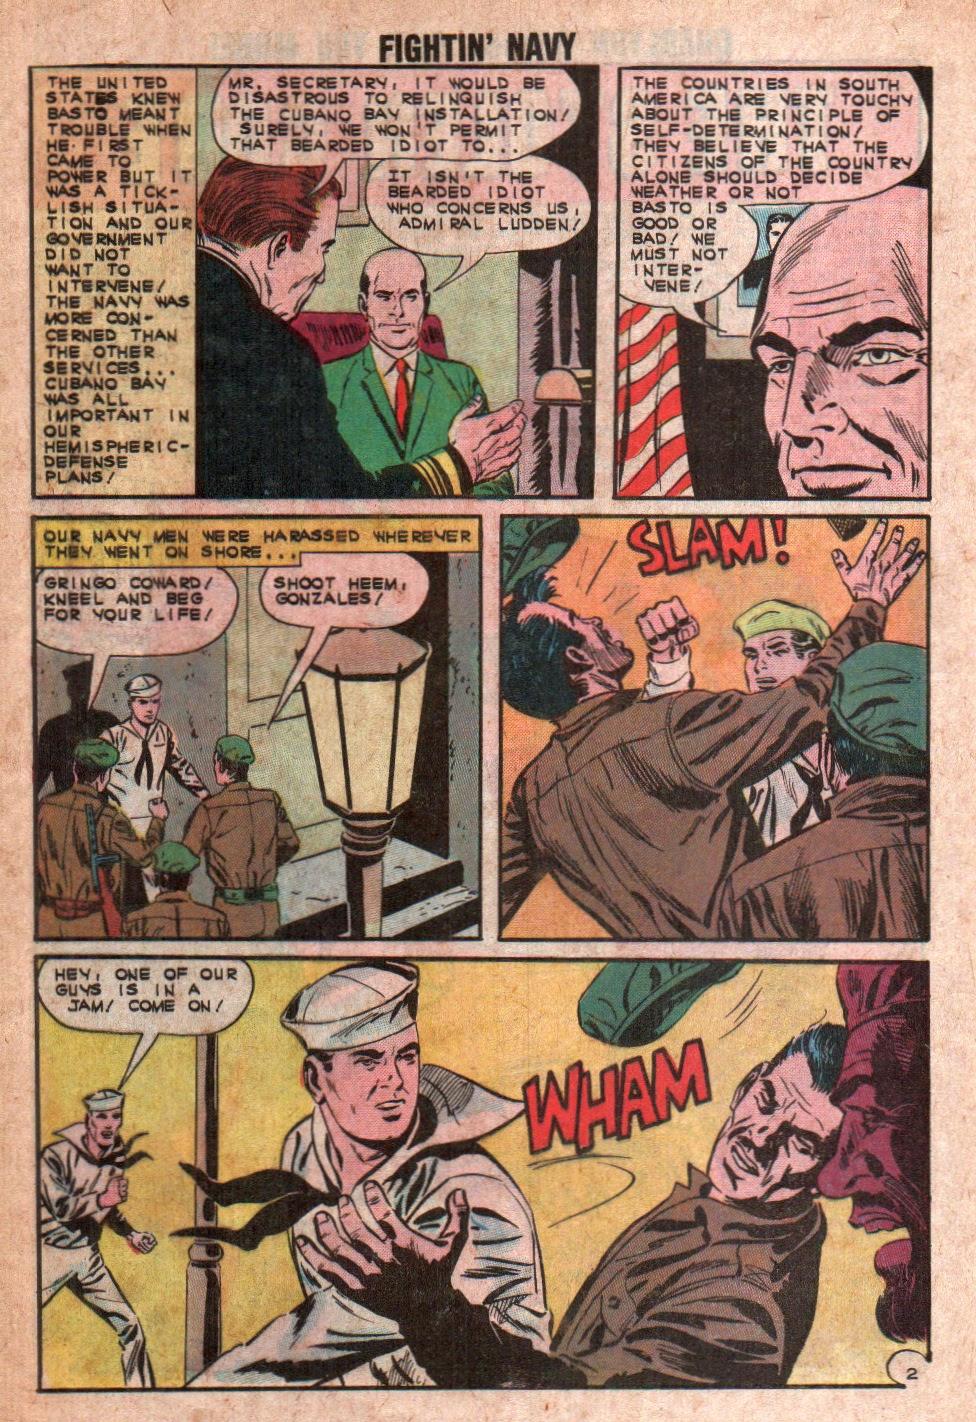 Read online Fightin' Navy comic -  Issue #108 - 12